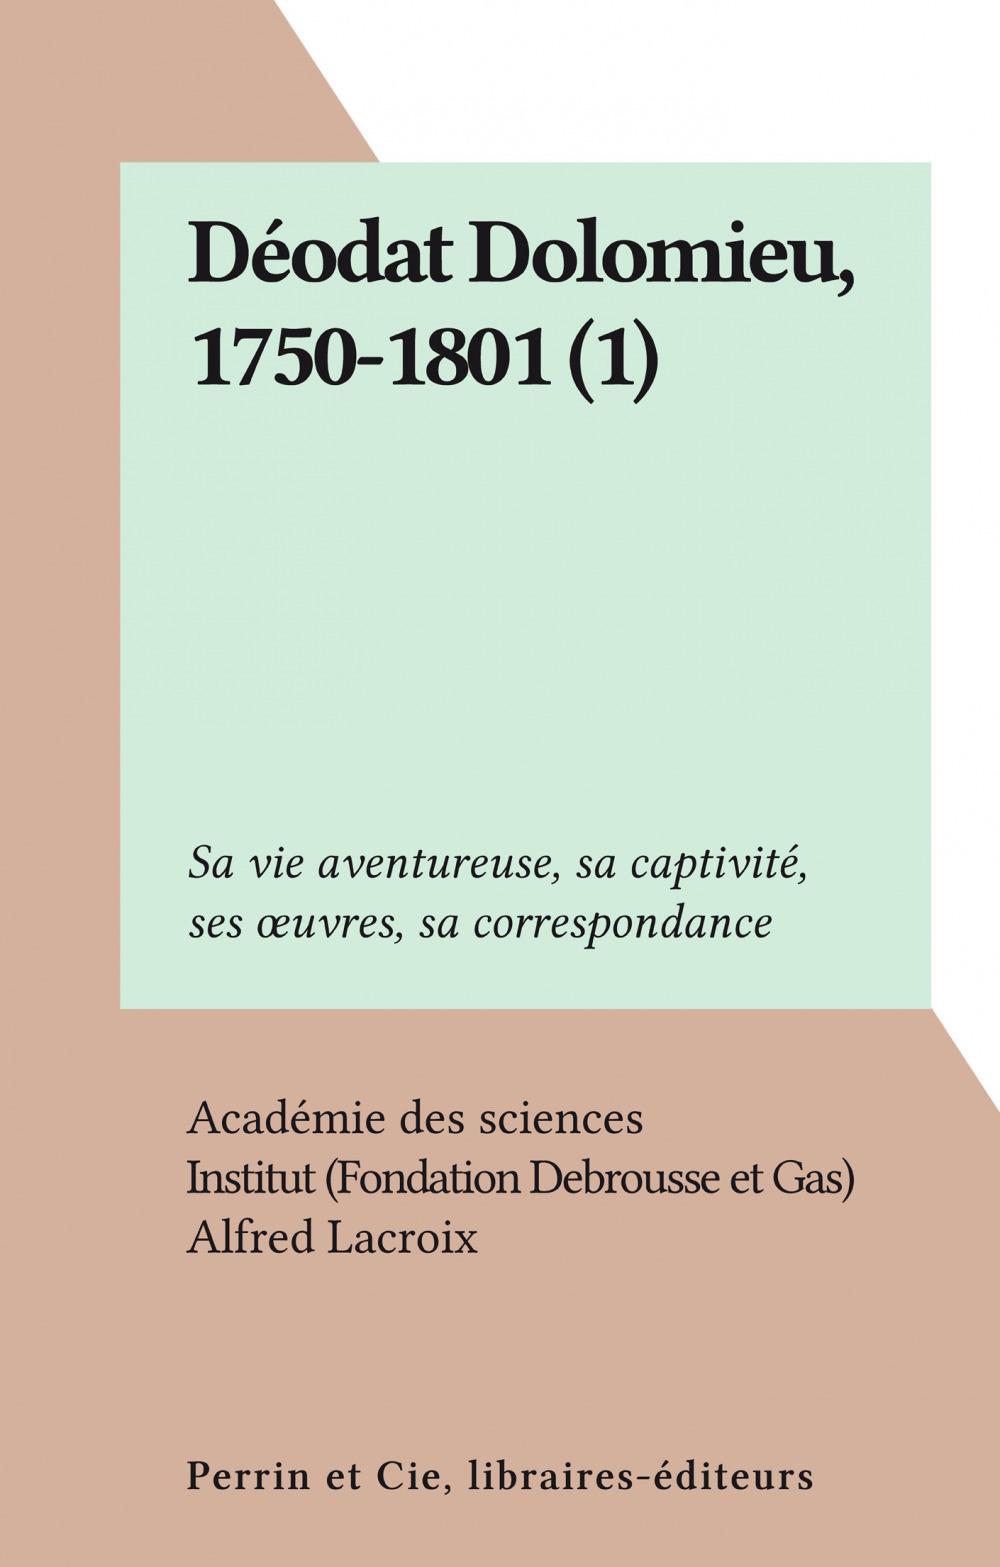 Déodat Dolomieu, 1750-1801 (1)